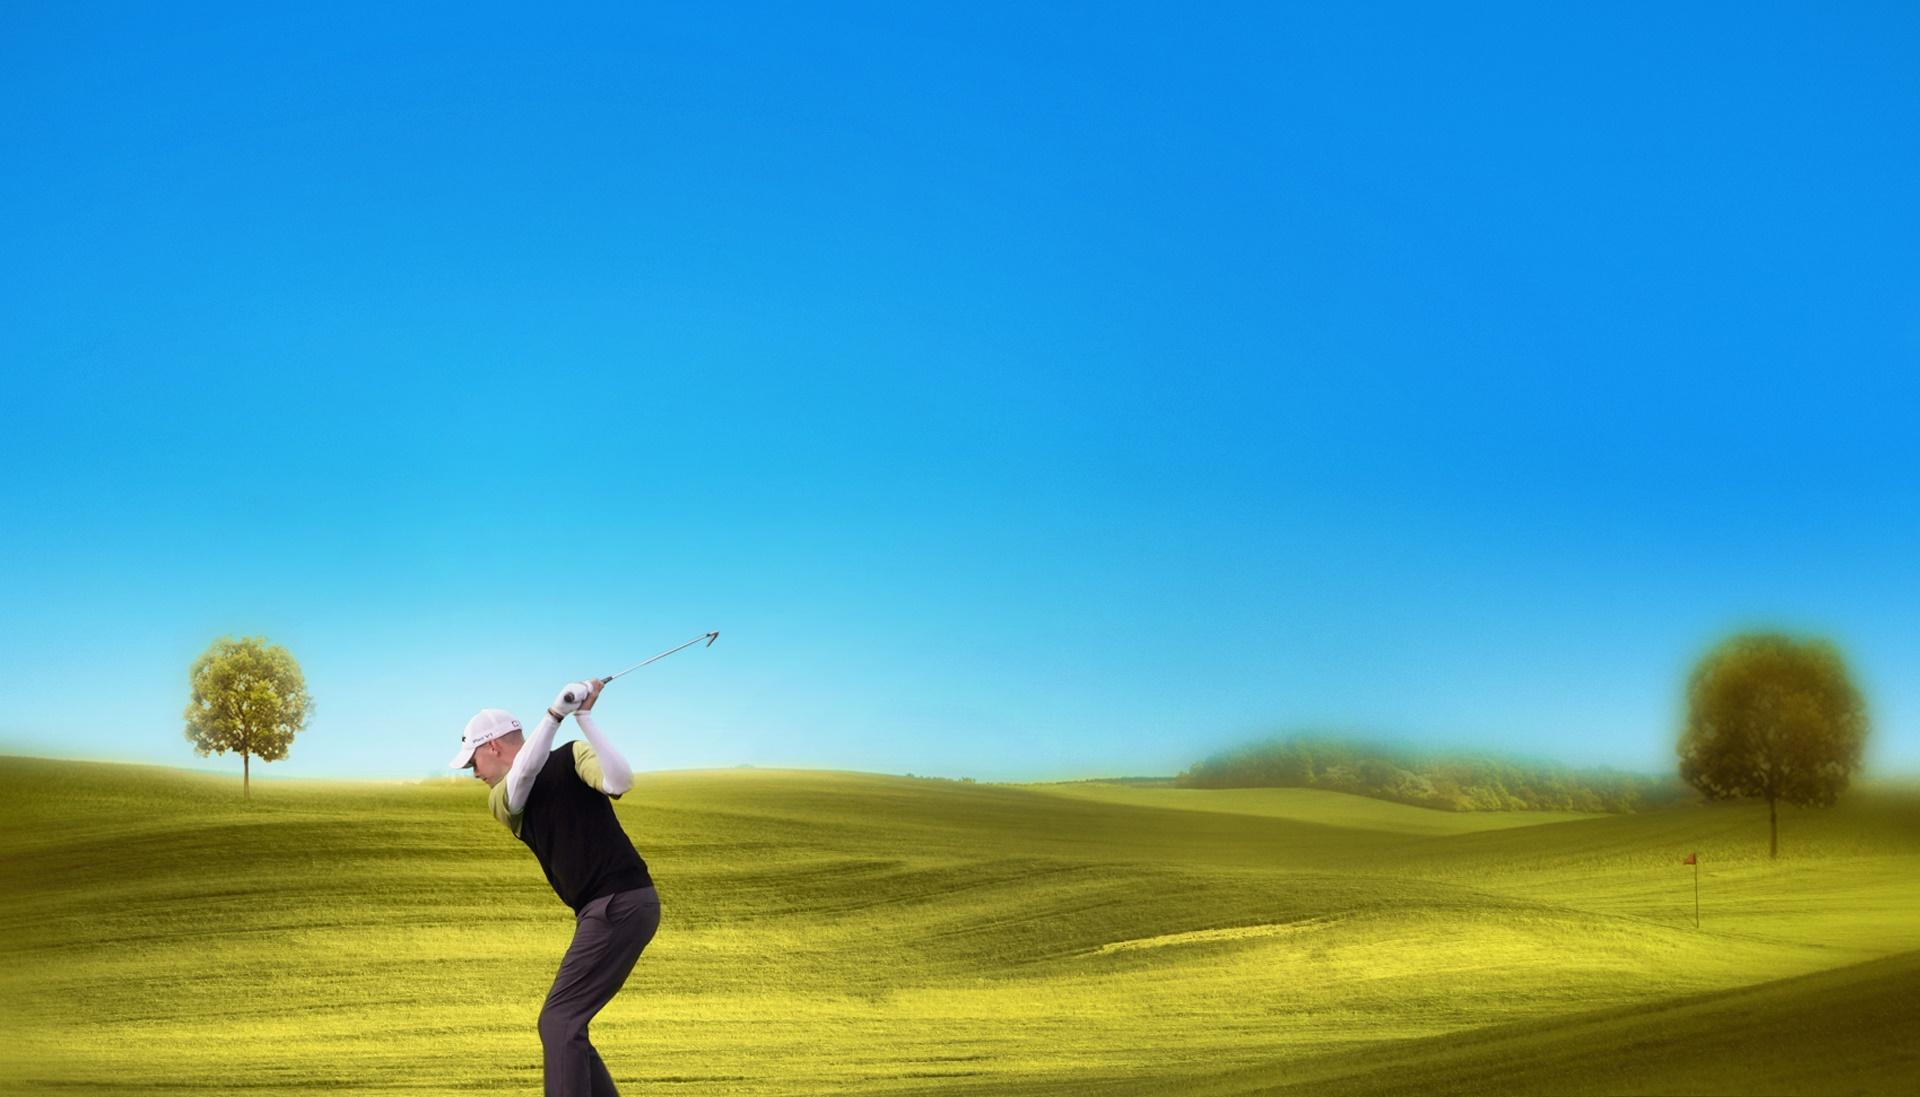 Cool Fall Wallpapers For Desktop Golf Wallpapers Hd Pixelstalk Net